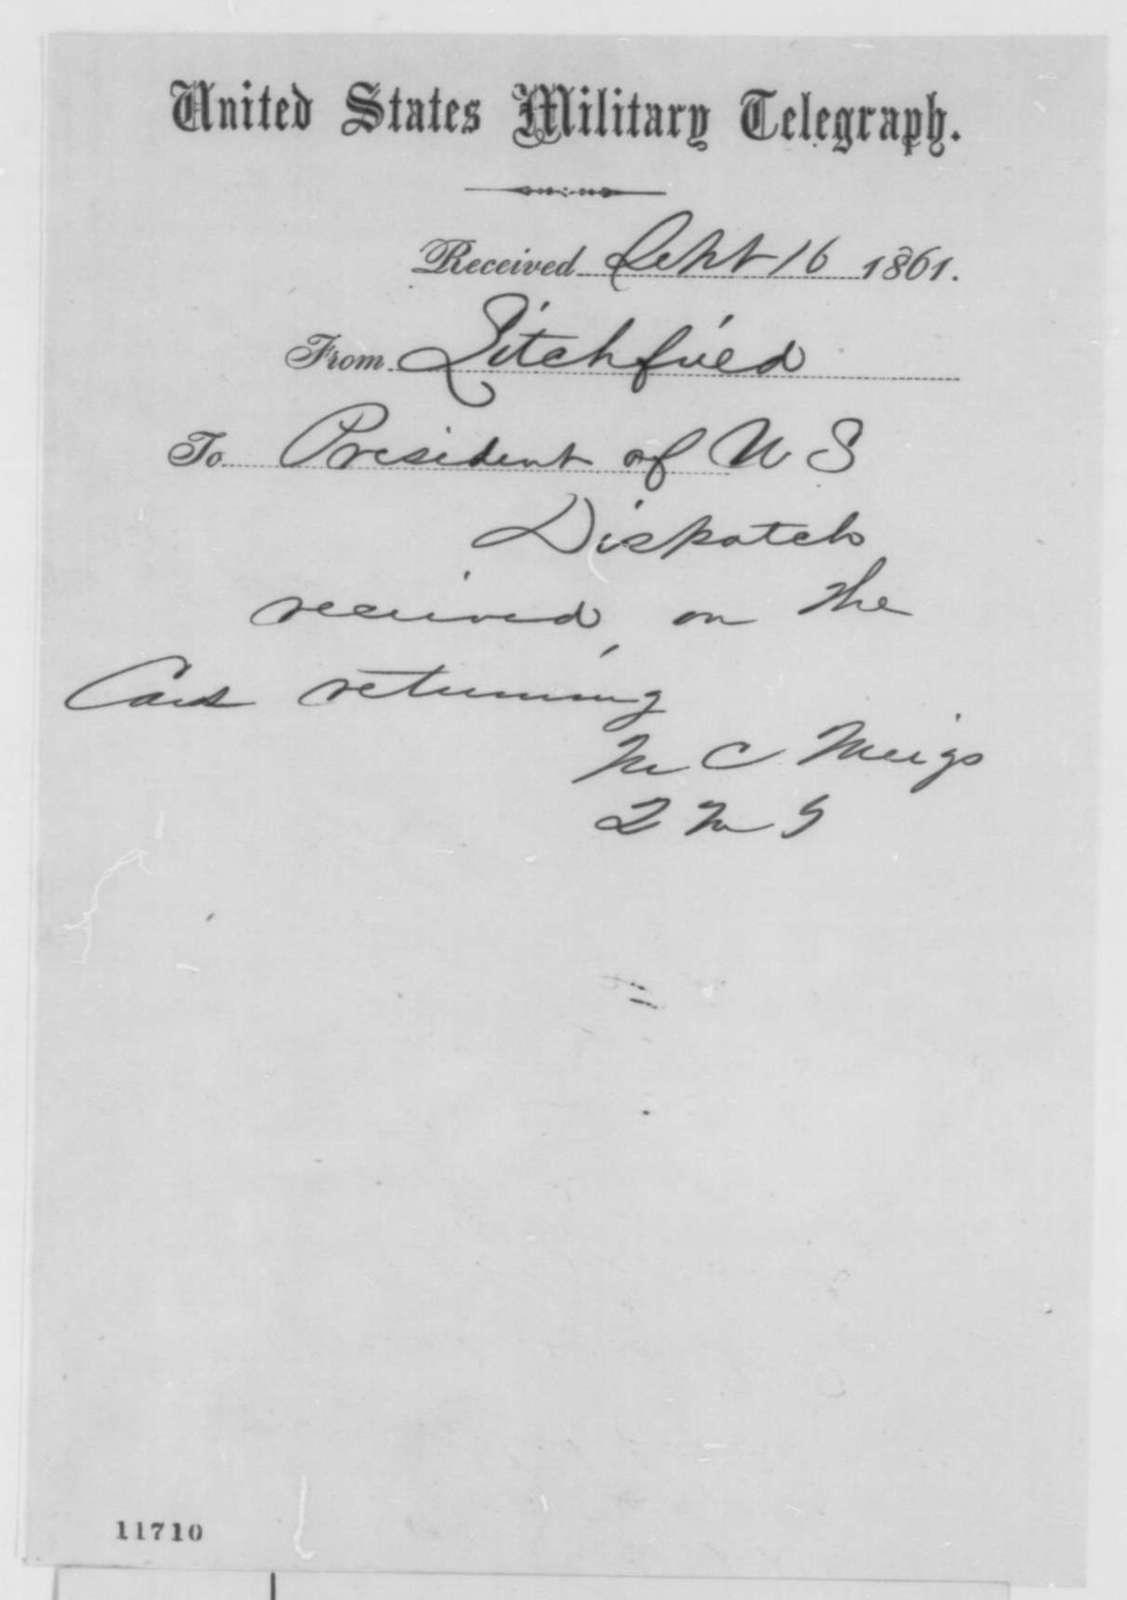 Montgomery C. Meigs to Abraham Lincoln, Monday, September 16, 1861  (Telegram acknowledging receipt of dispatch)